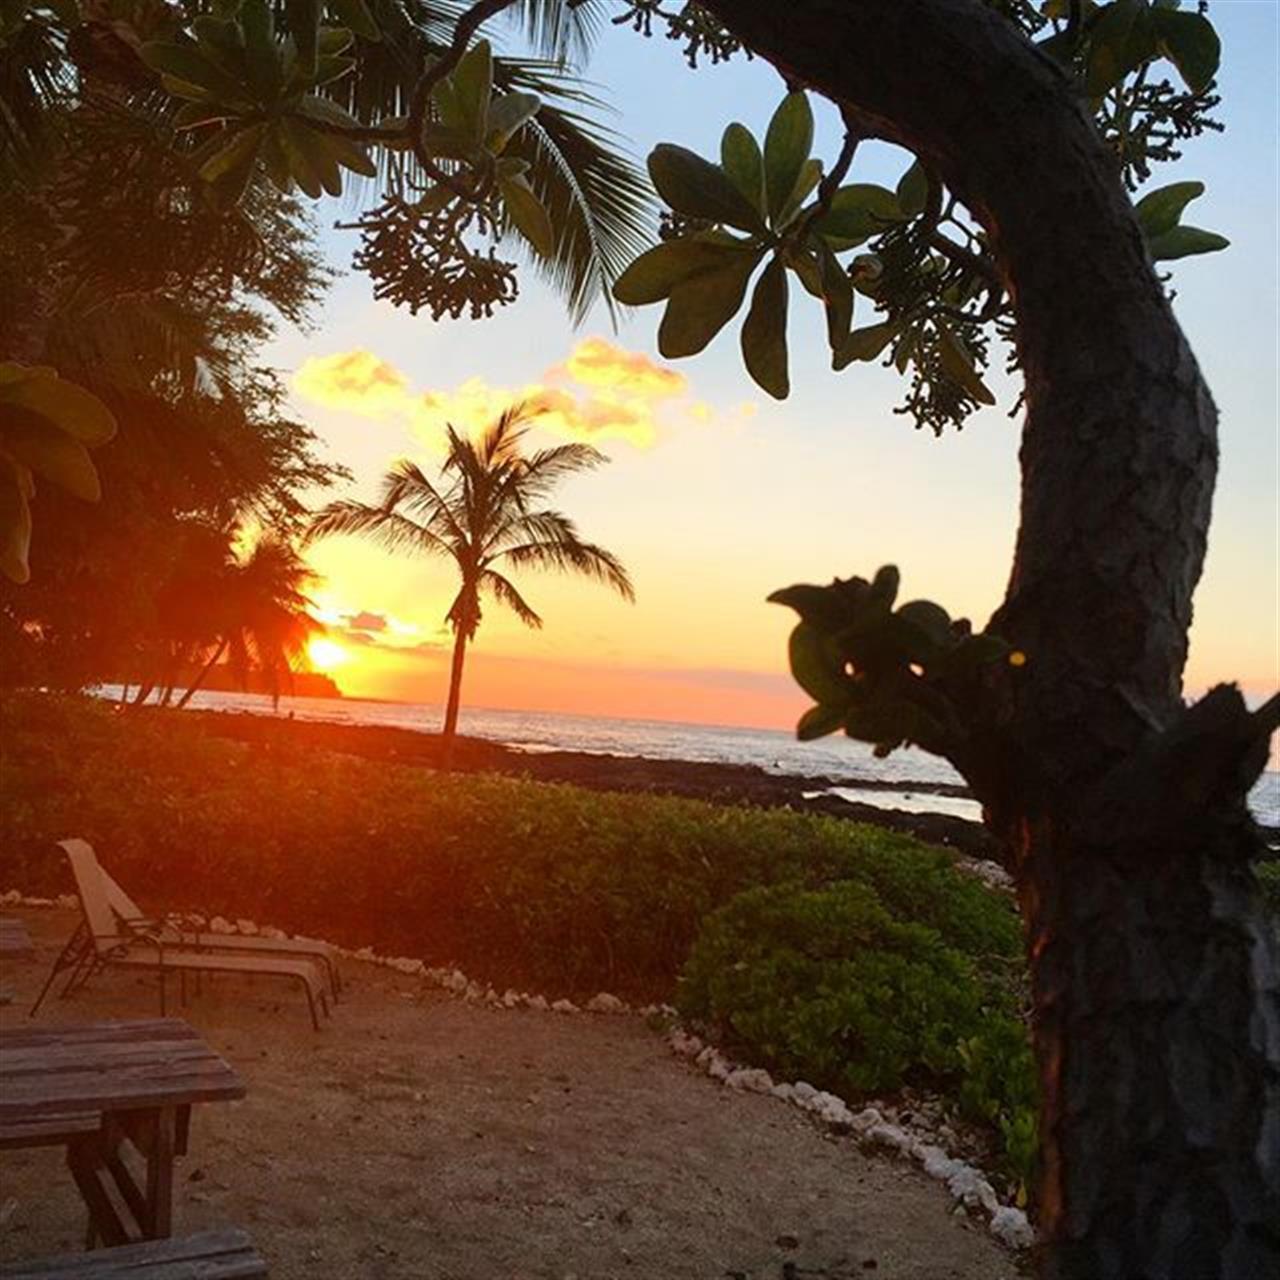 #sunbeam sunset in #Puako tonight! ?? Always amazing! #hnnsunrise #leadingrelocal #hawaiilife #beemary @puakopattie @derbyfarms